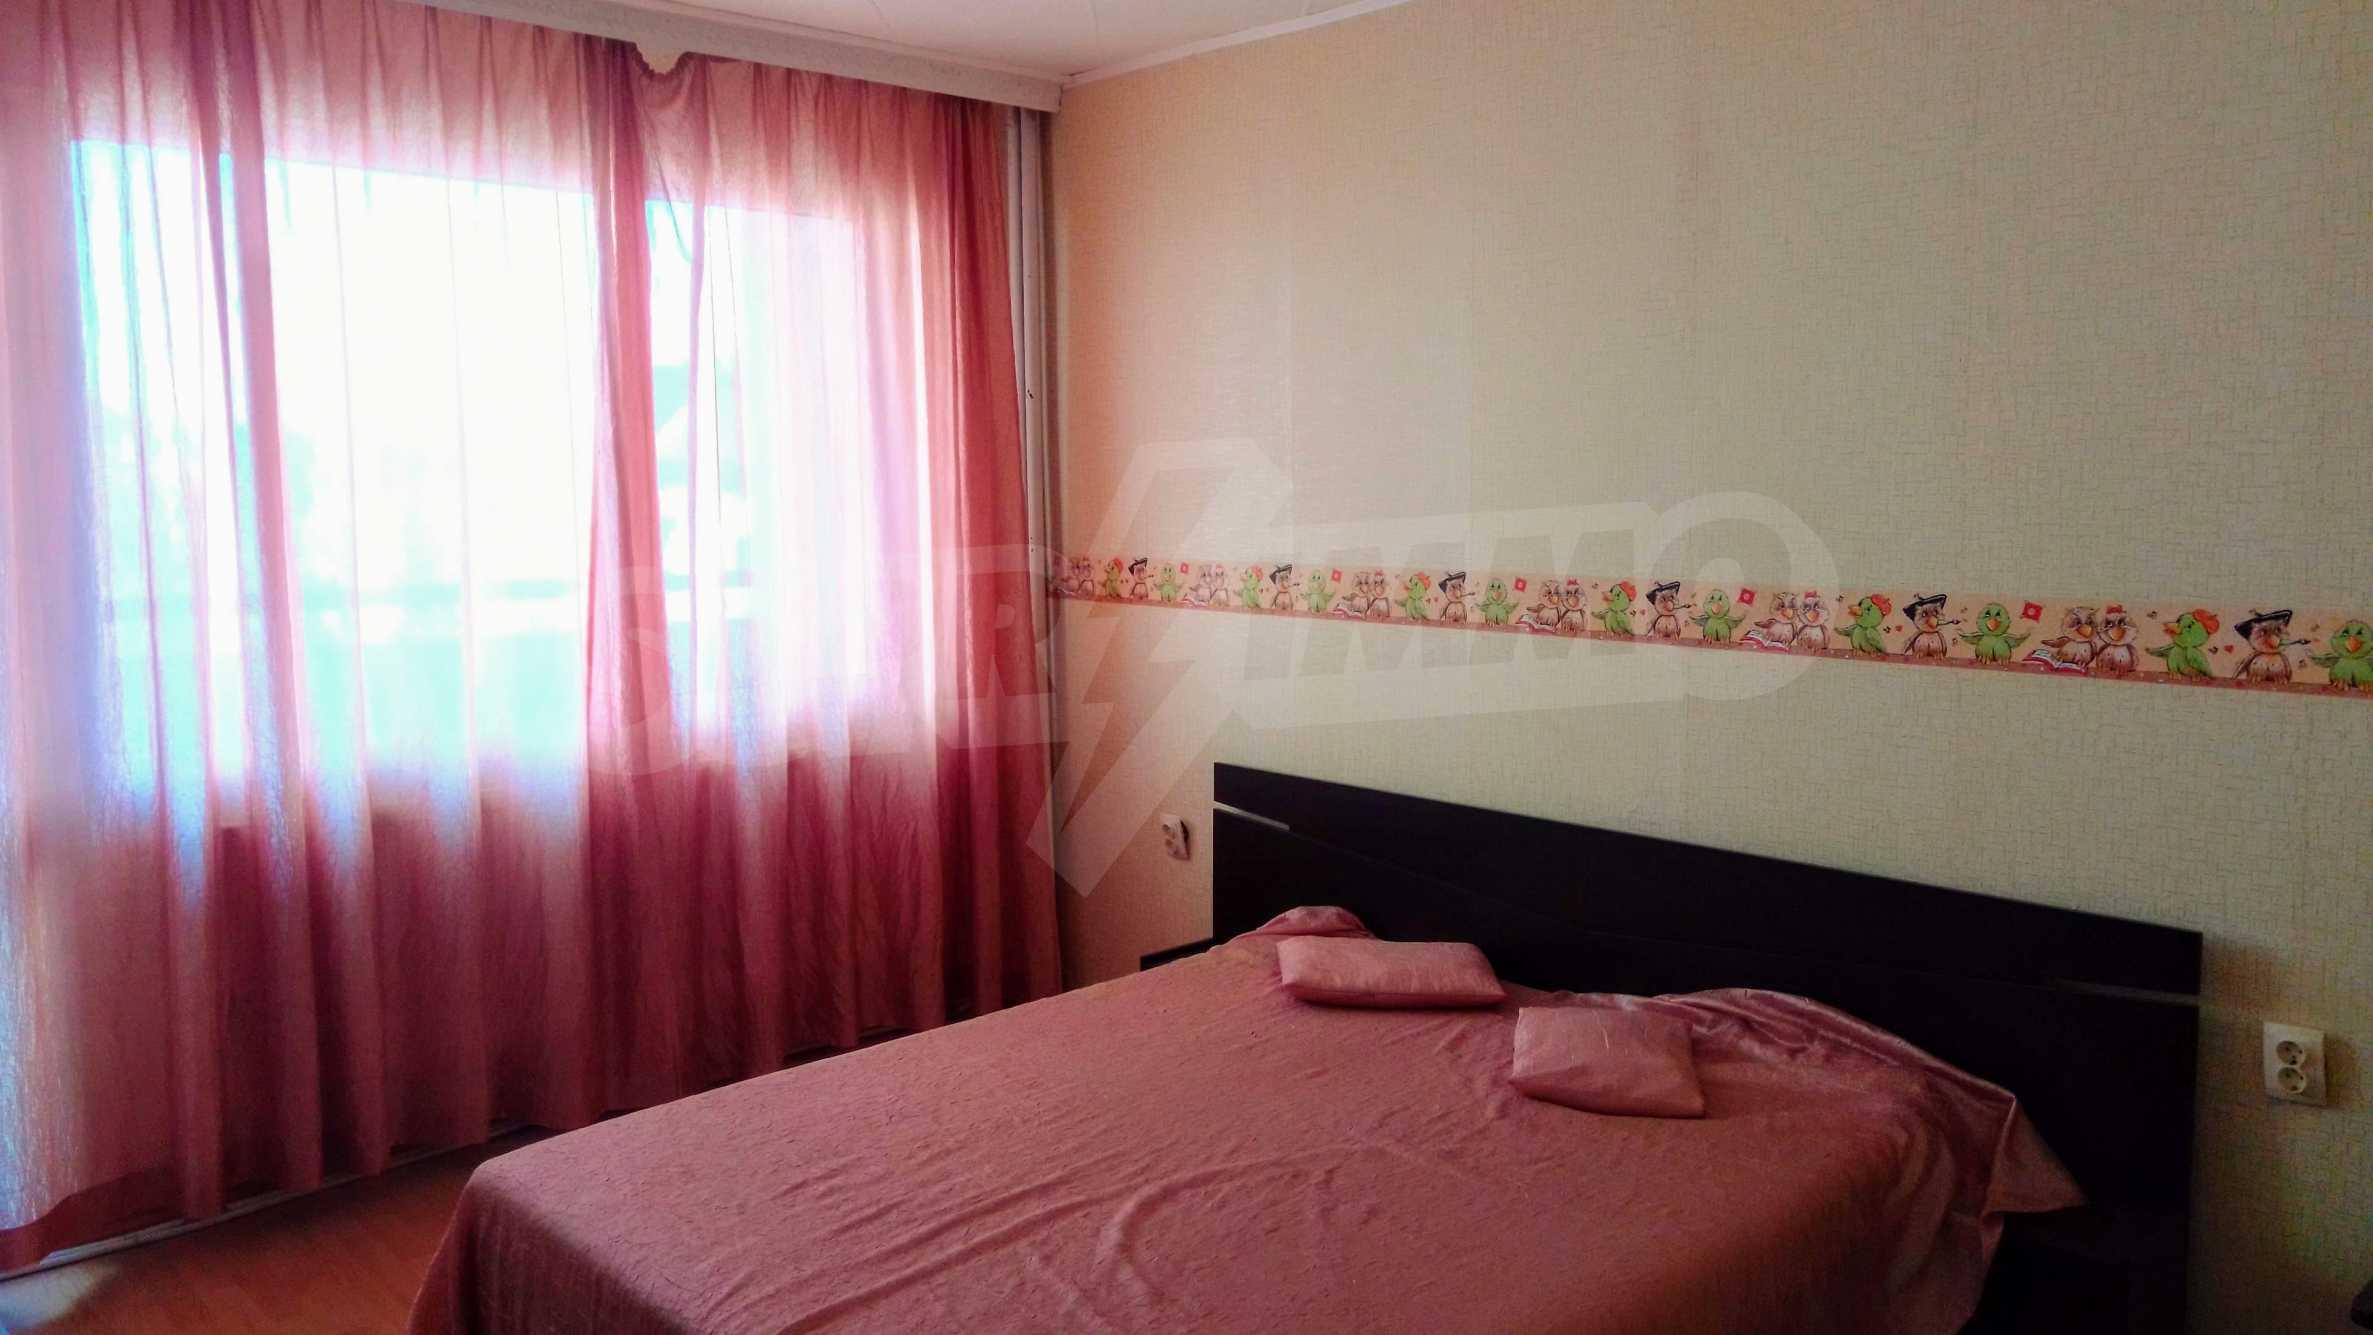 Слънчев тристаен апартамент в град Севлиево  5